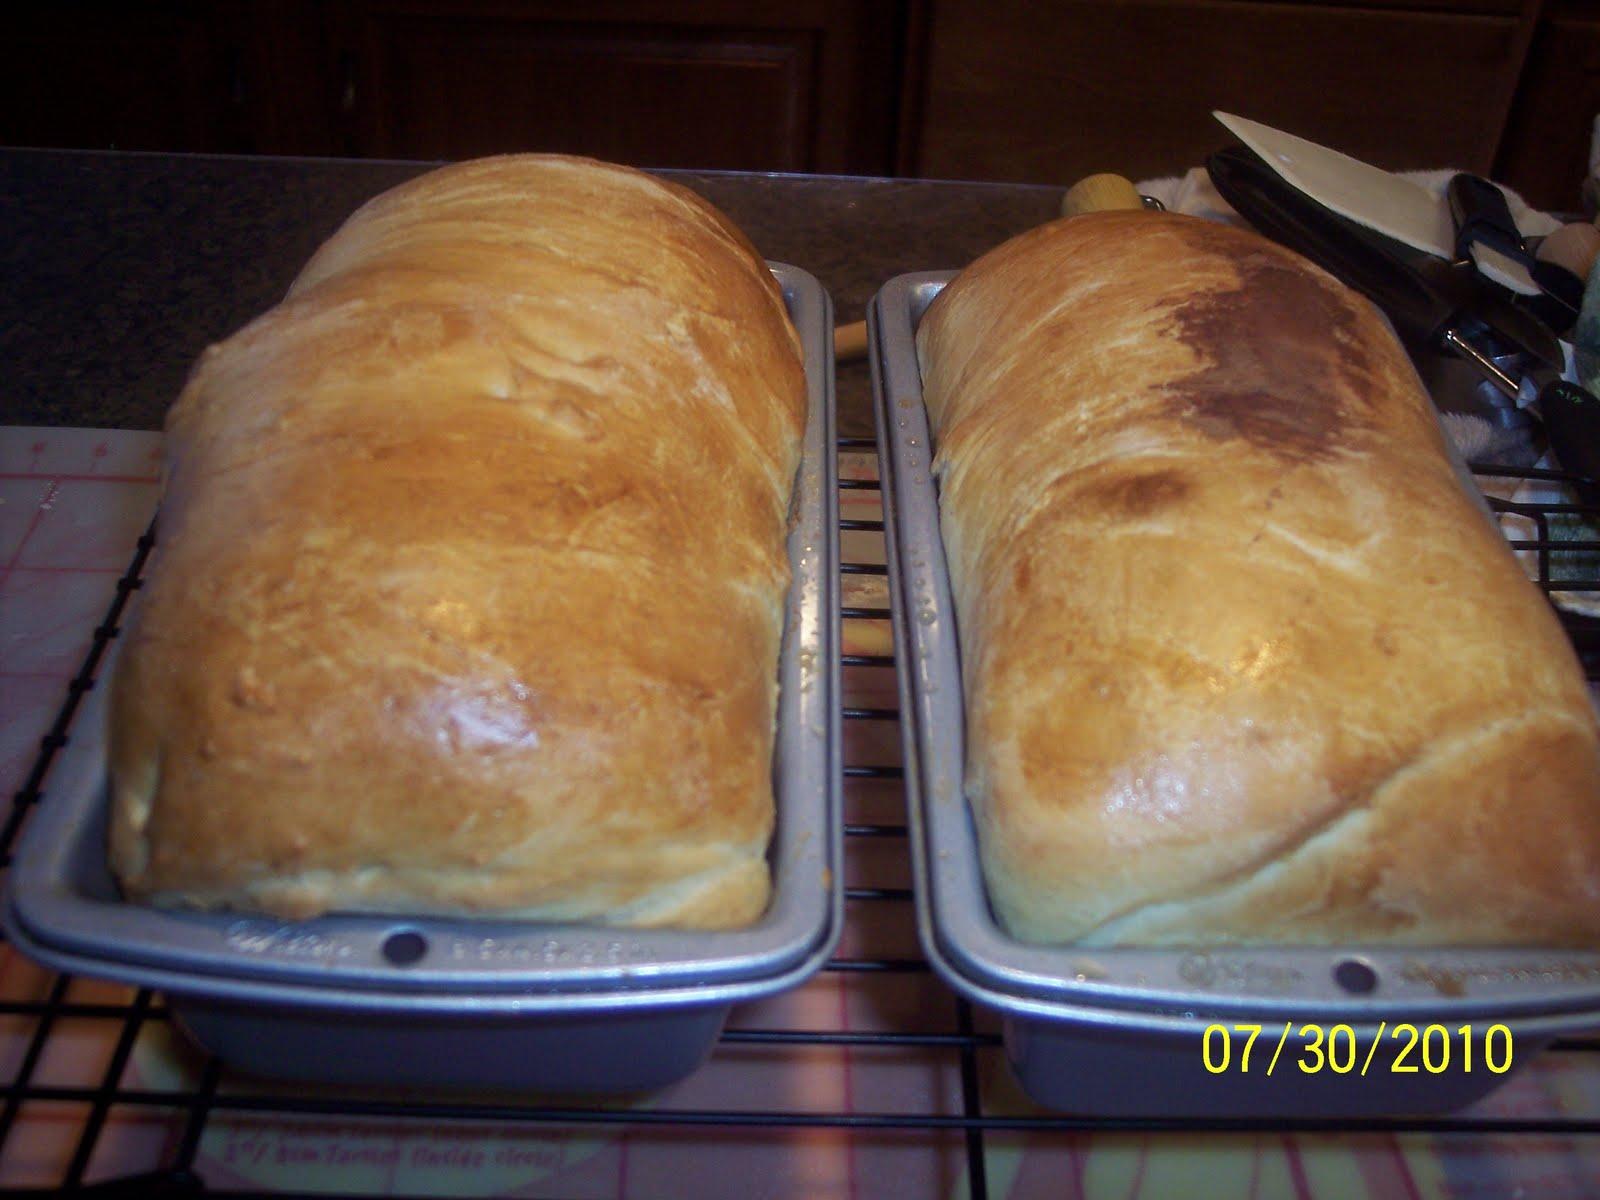 how to use kitchenaid mixer to make bread